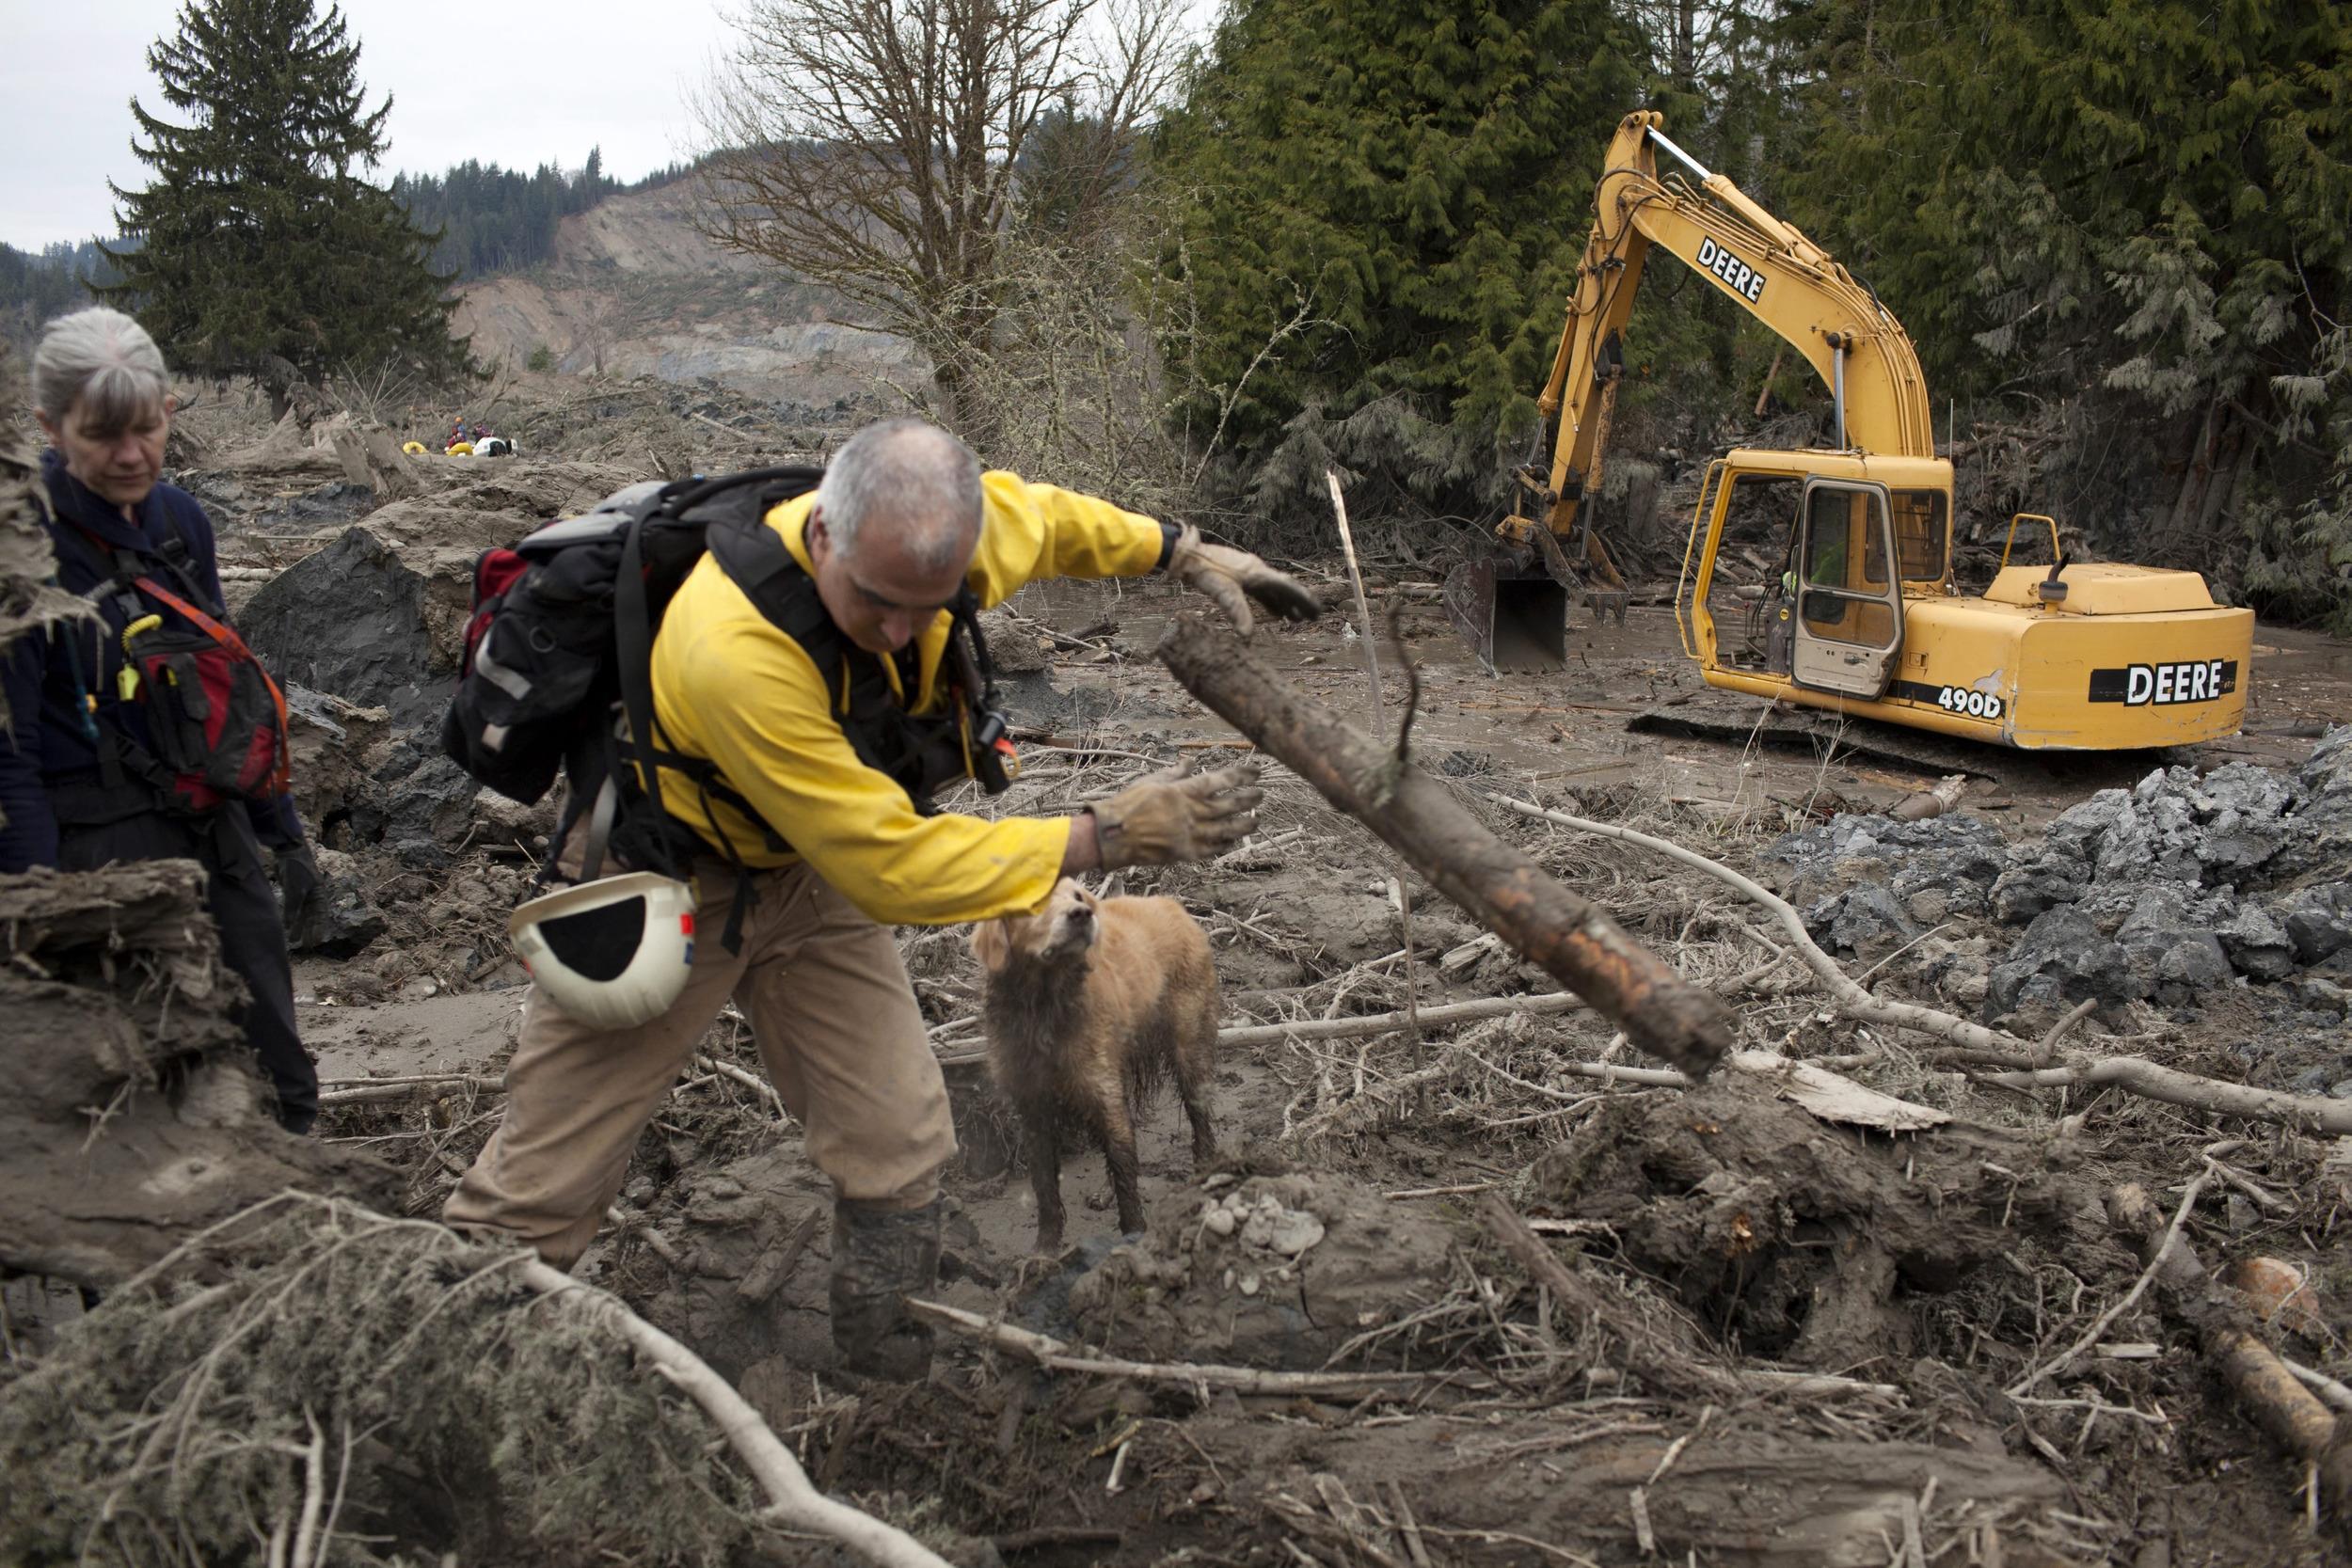 Image: Mudslide aftermath in Oso, Washington